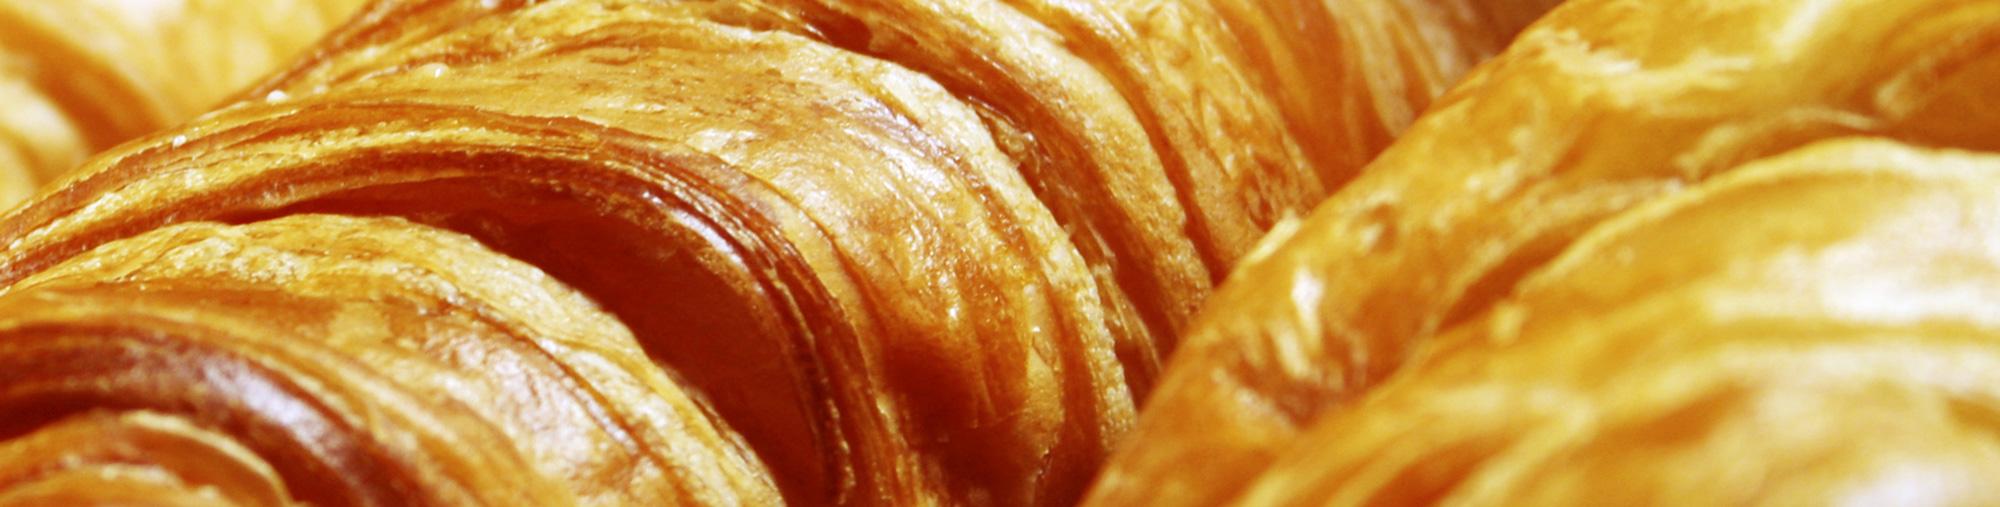 h2-croissant1.jpg